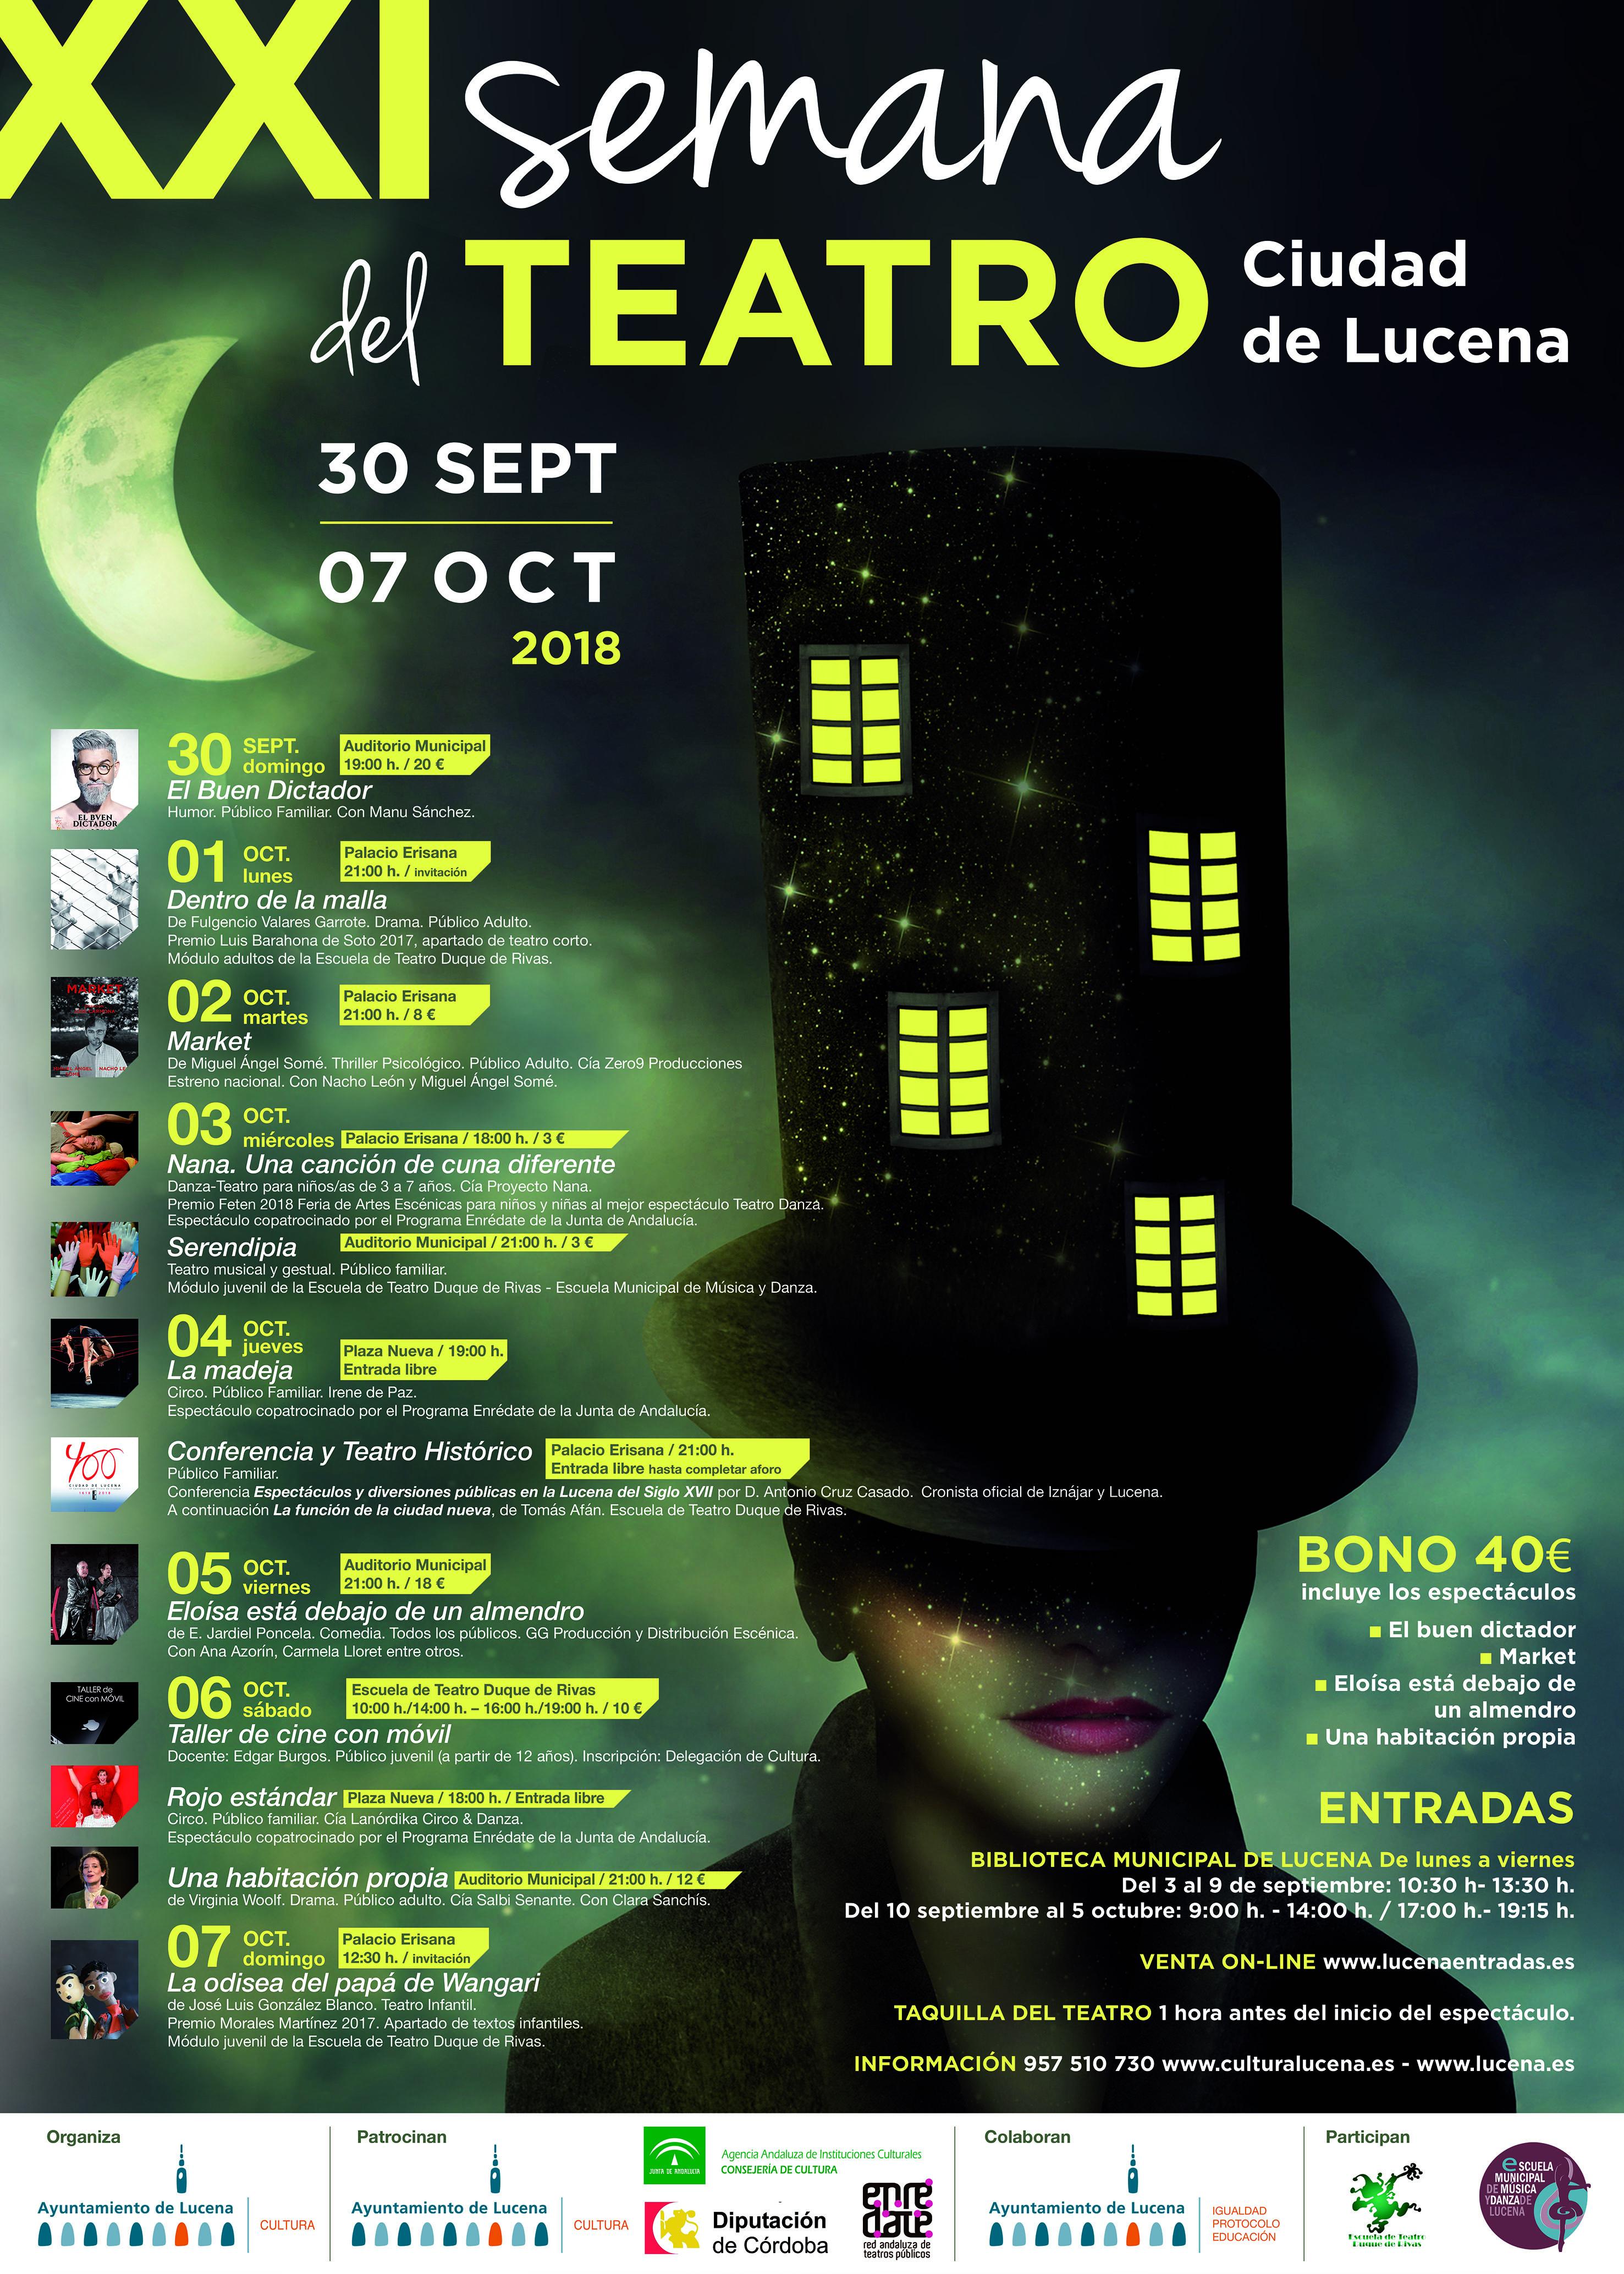 http://www.culturalucena.es/wp-content/uploads/2018/09/CARTELSEMANATEATRO2018.jpg